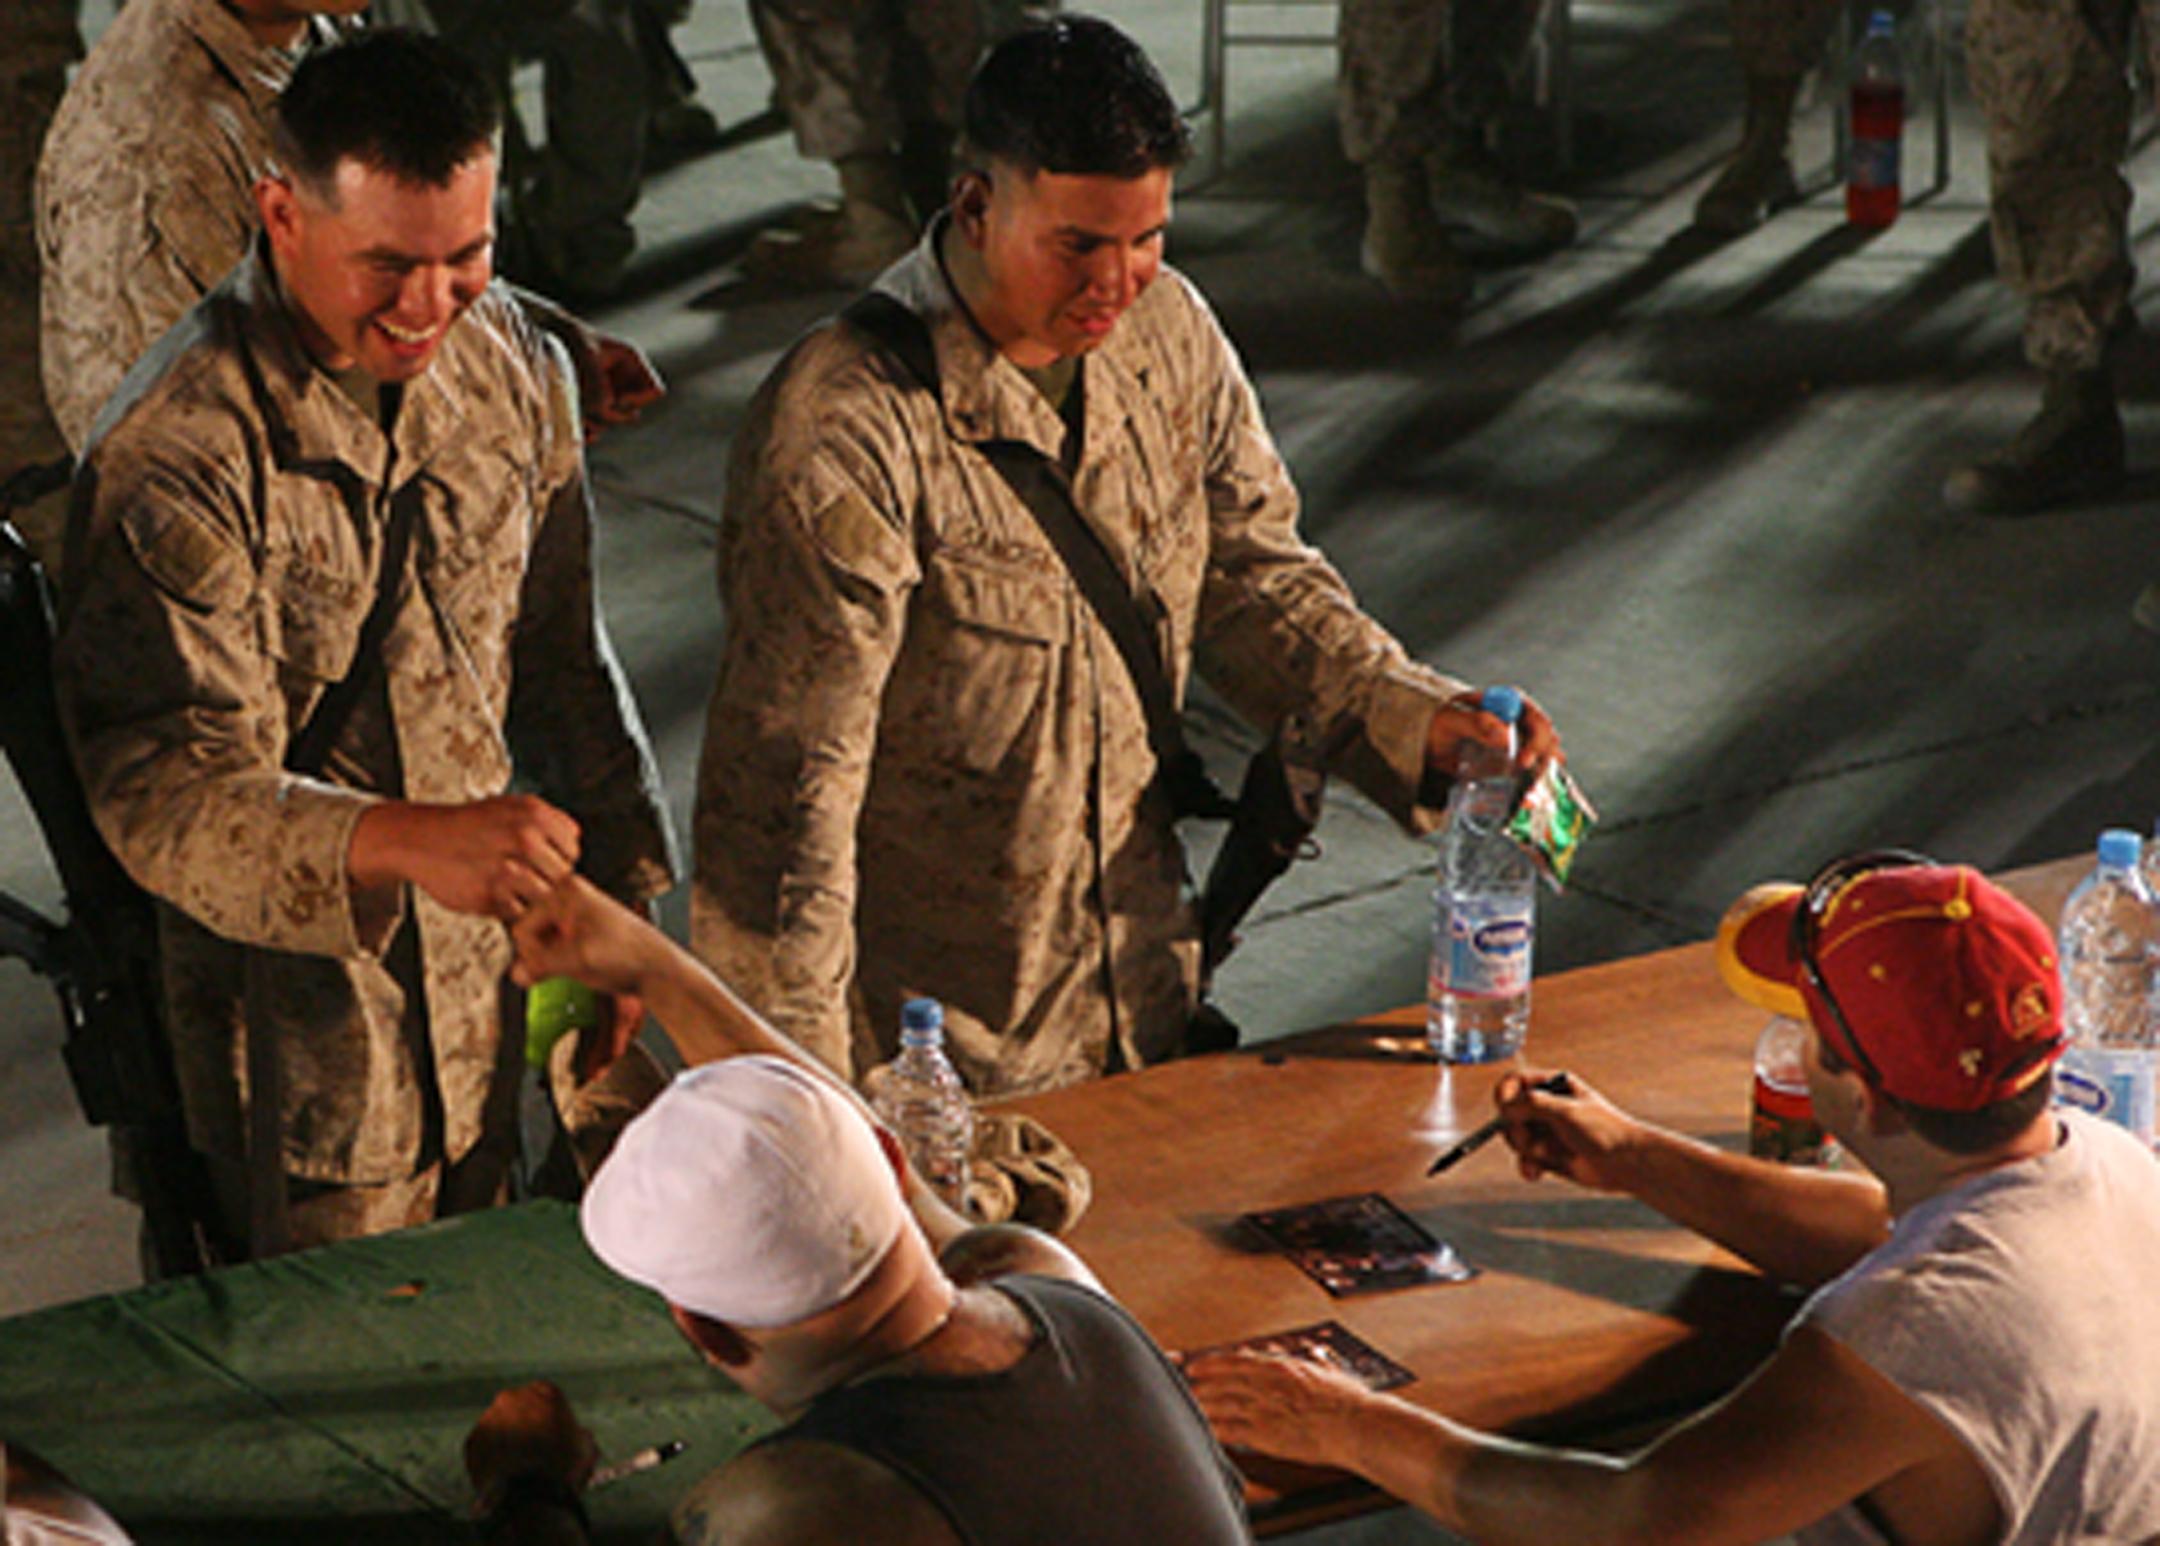 File:Latin-Jazz Rhythm Rocks Marines, Sailors and Soldiers